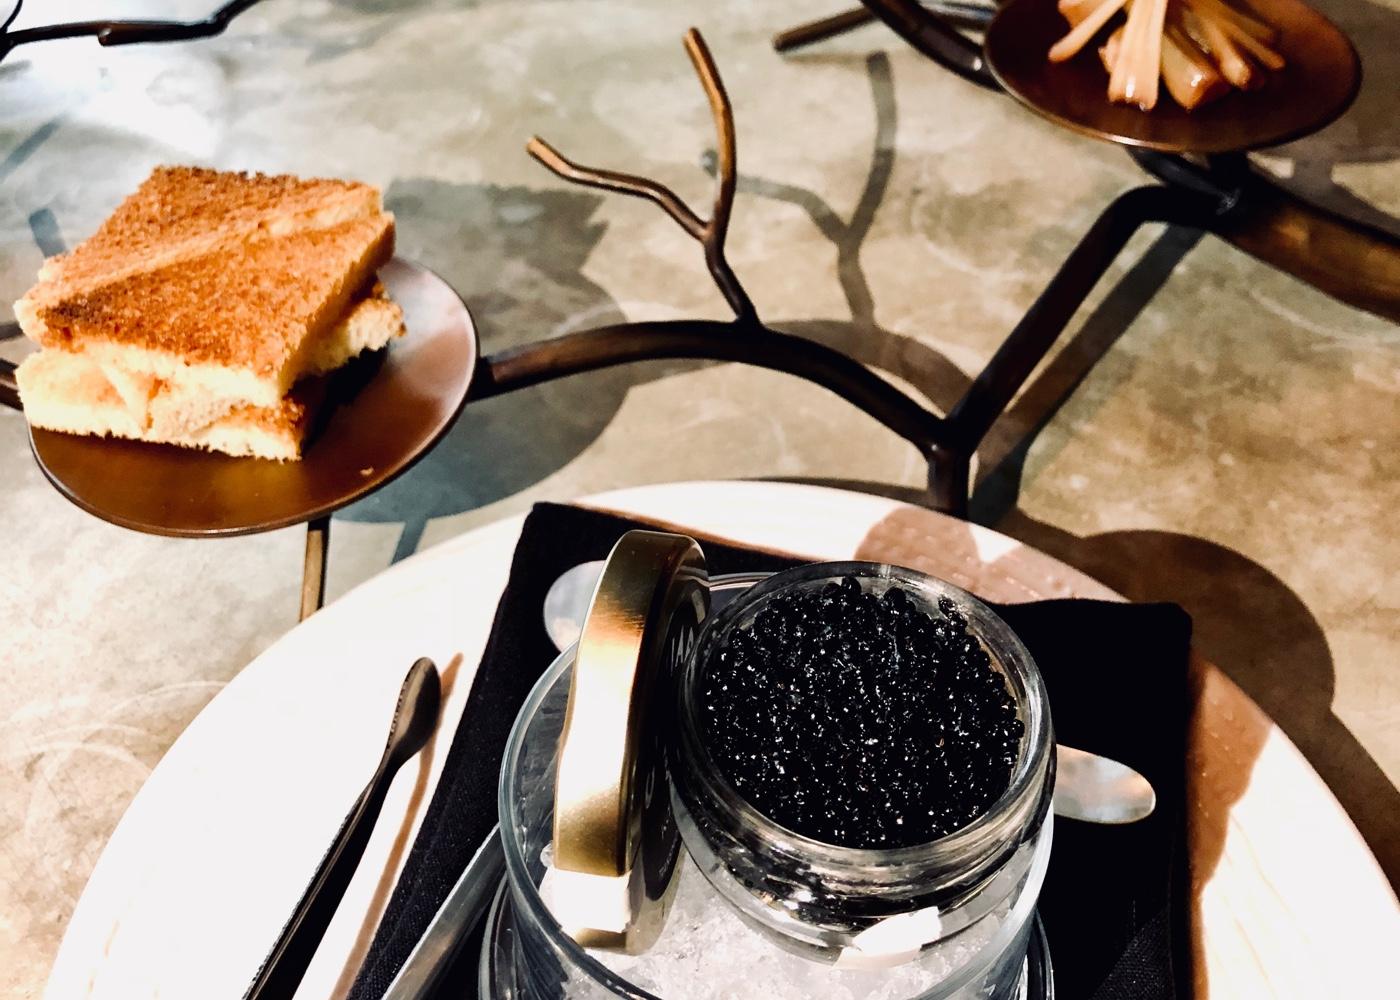 Serious Eats Guide: How To Buy Caviar - Serious Eats